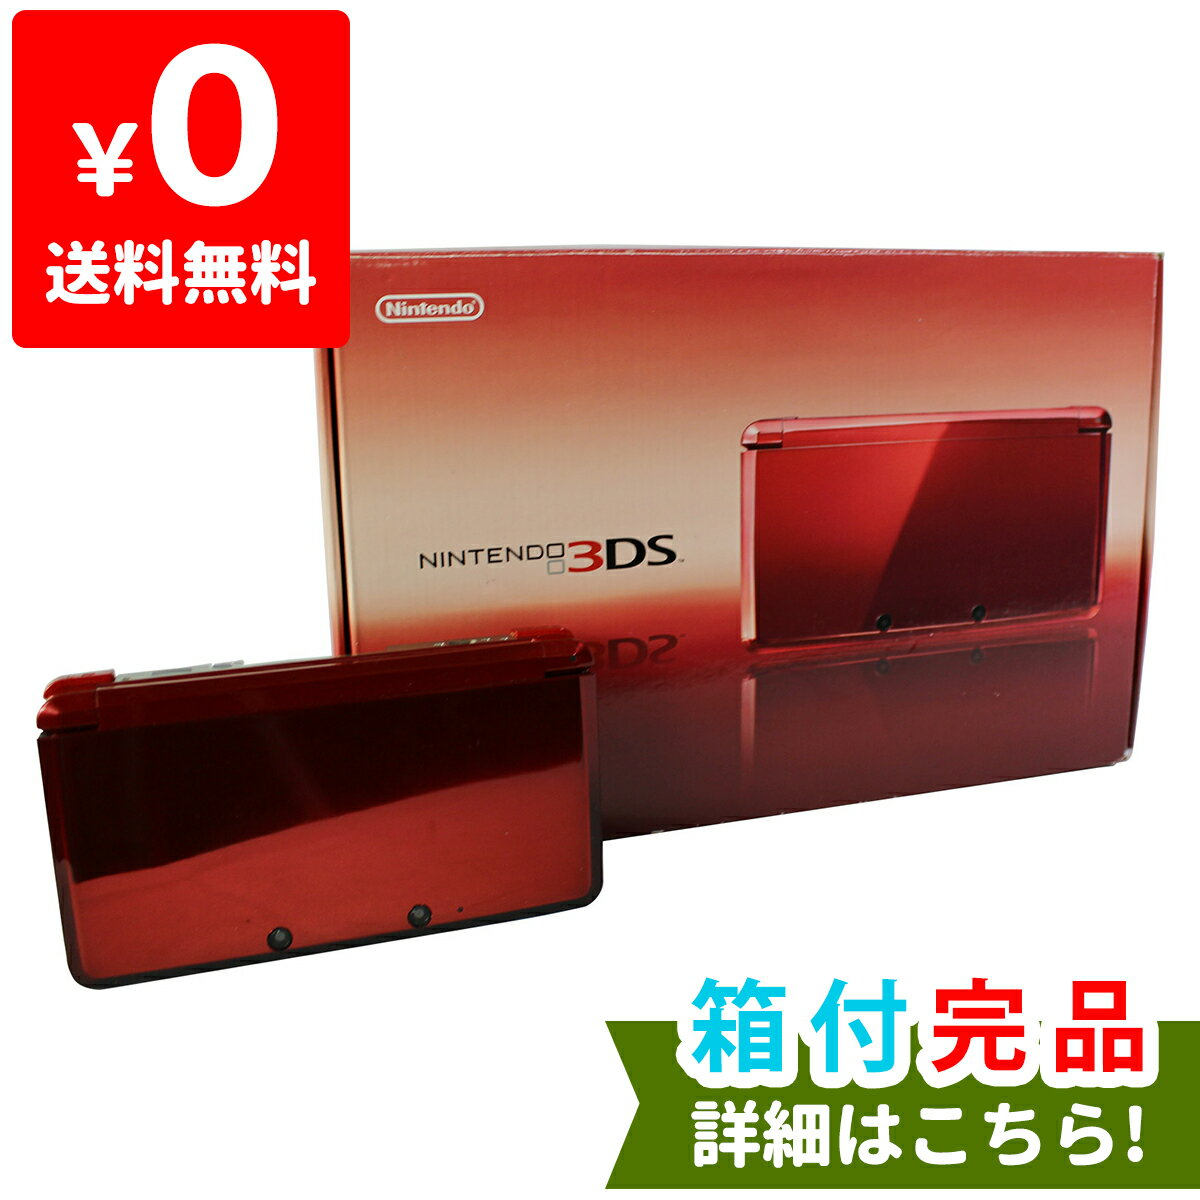 3DS 本体 フレアレッド ニンテンドー 任天堂 NINTENDO ゲーム機 中古 4902370519013 送料無料 【中古】